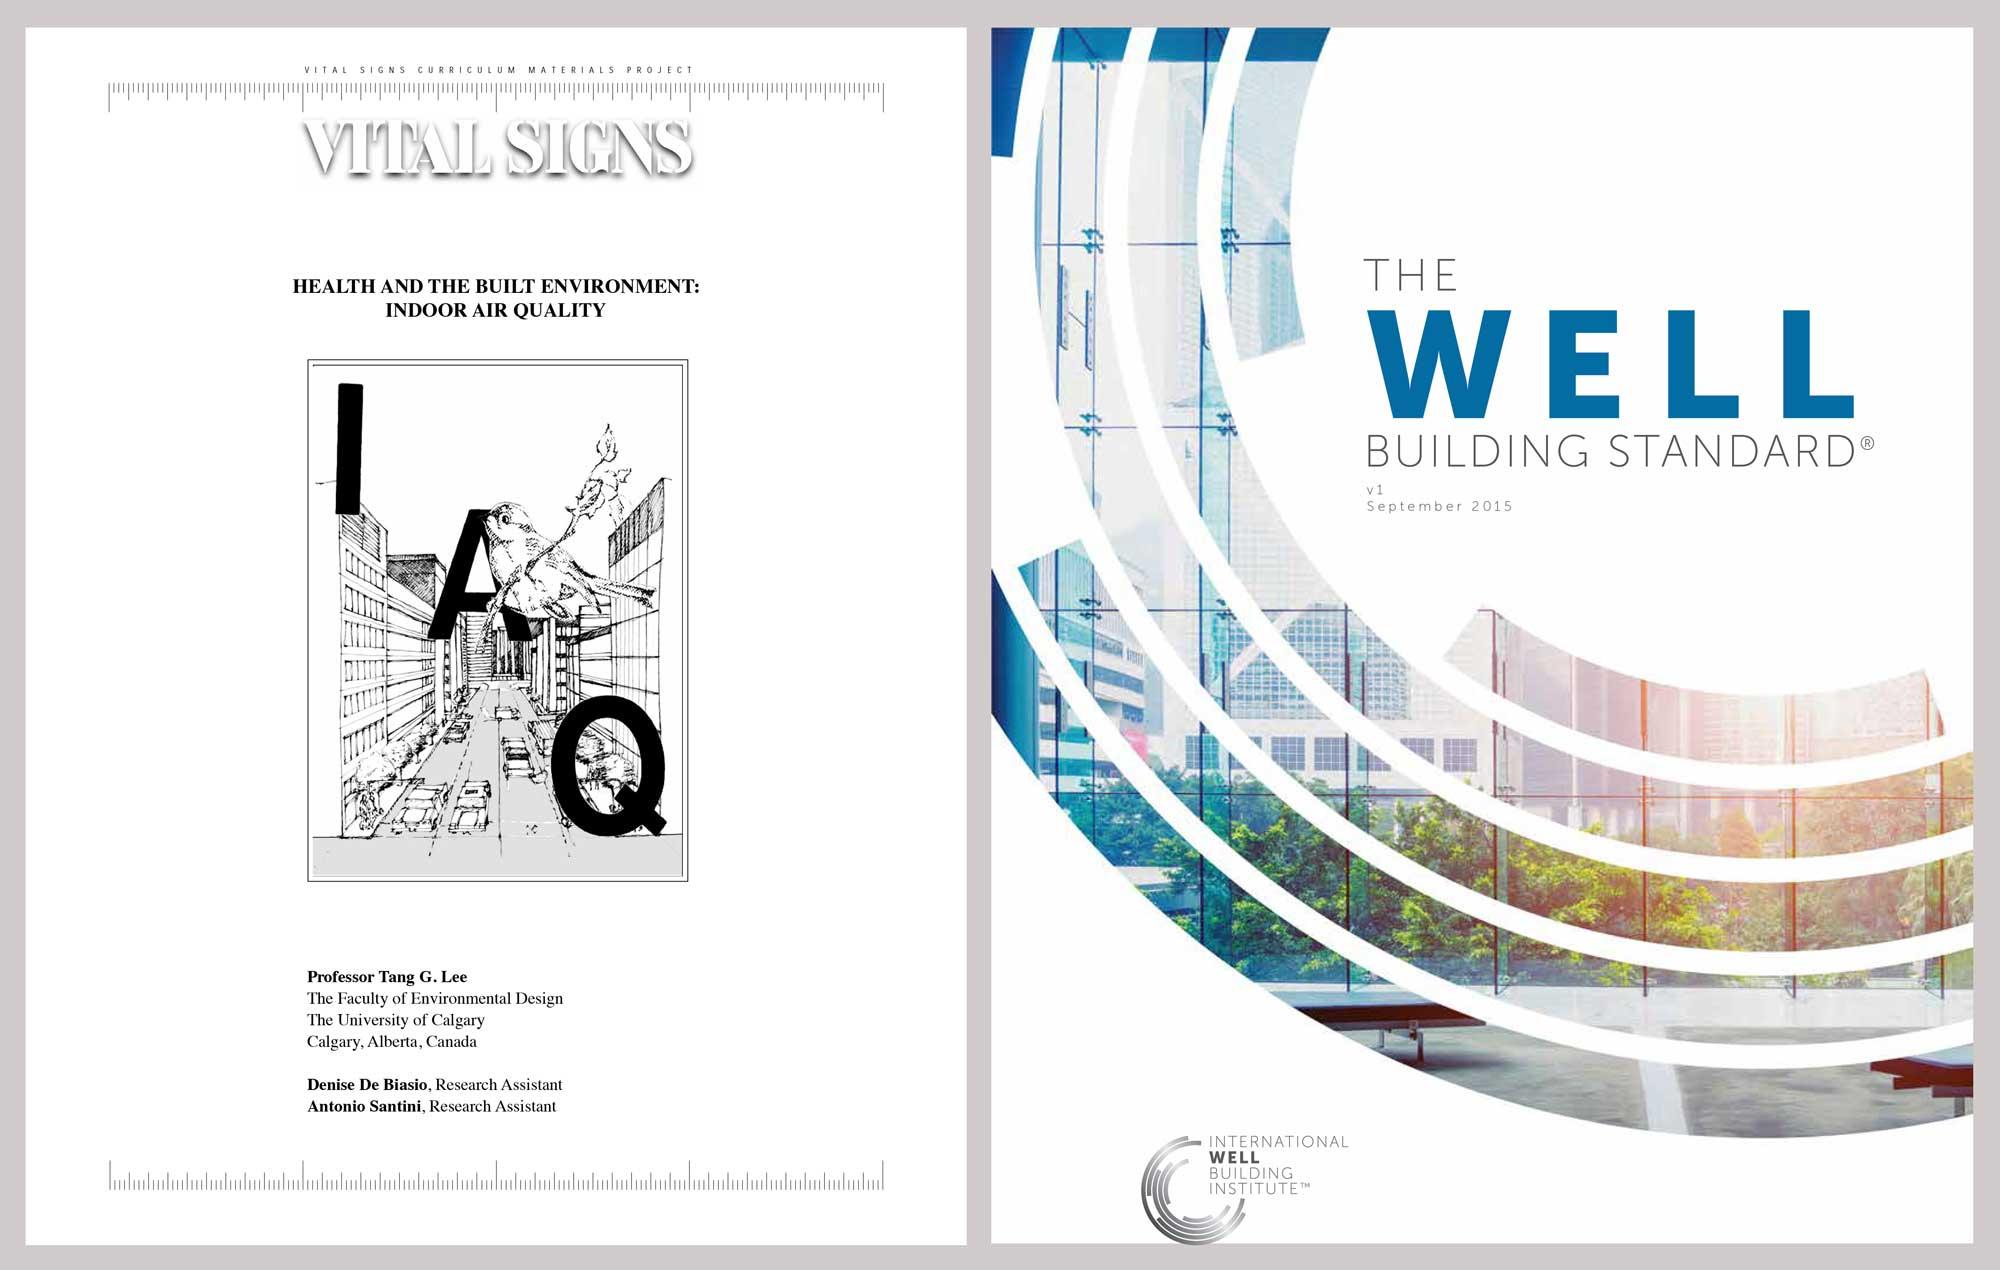 WELL-Building-Standard-Blog-Post